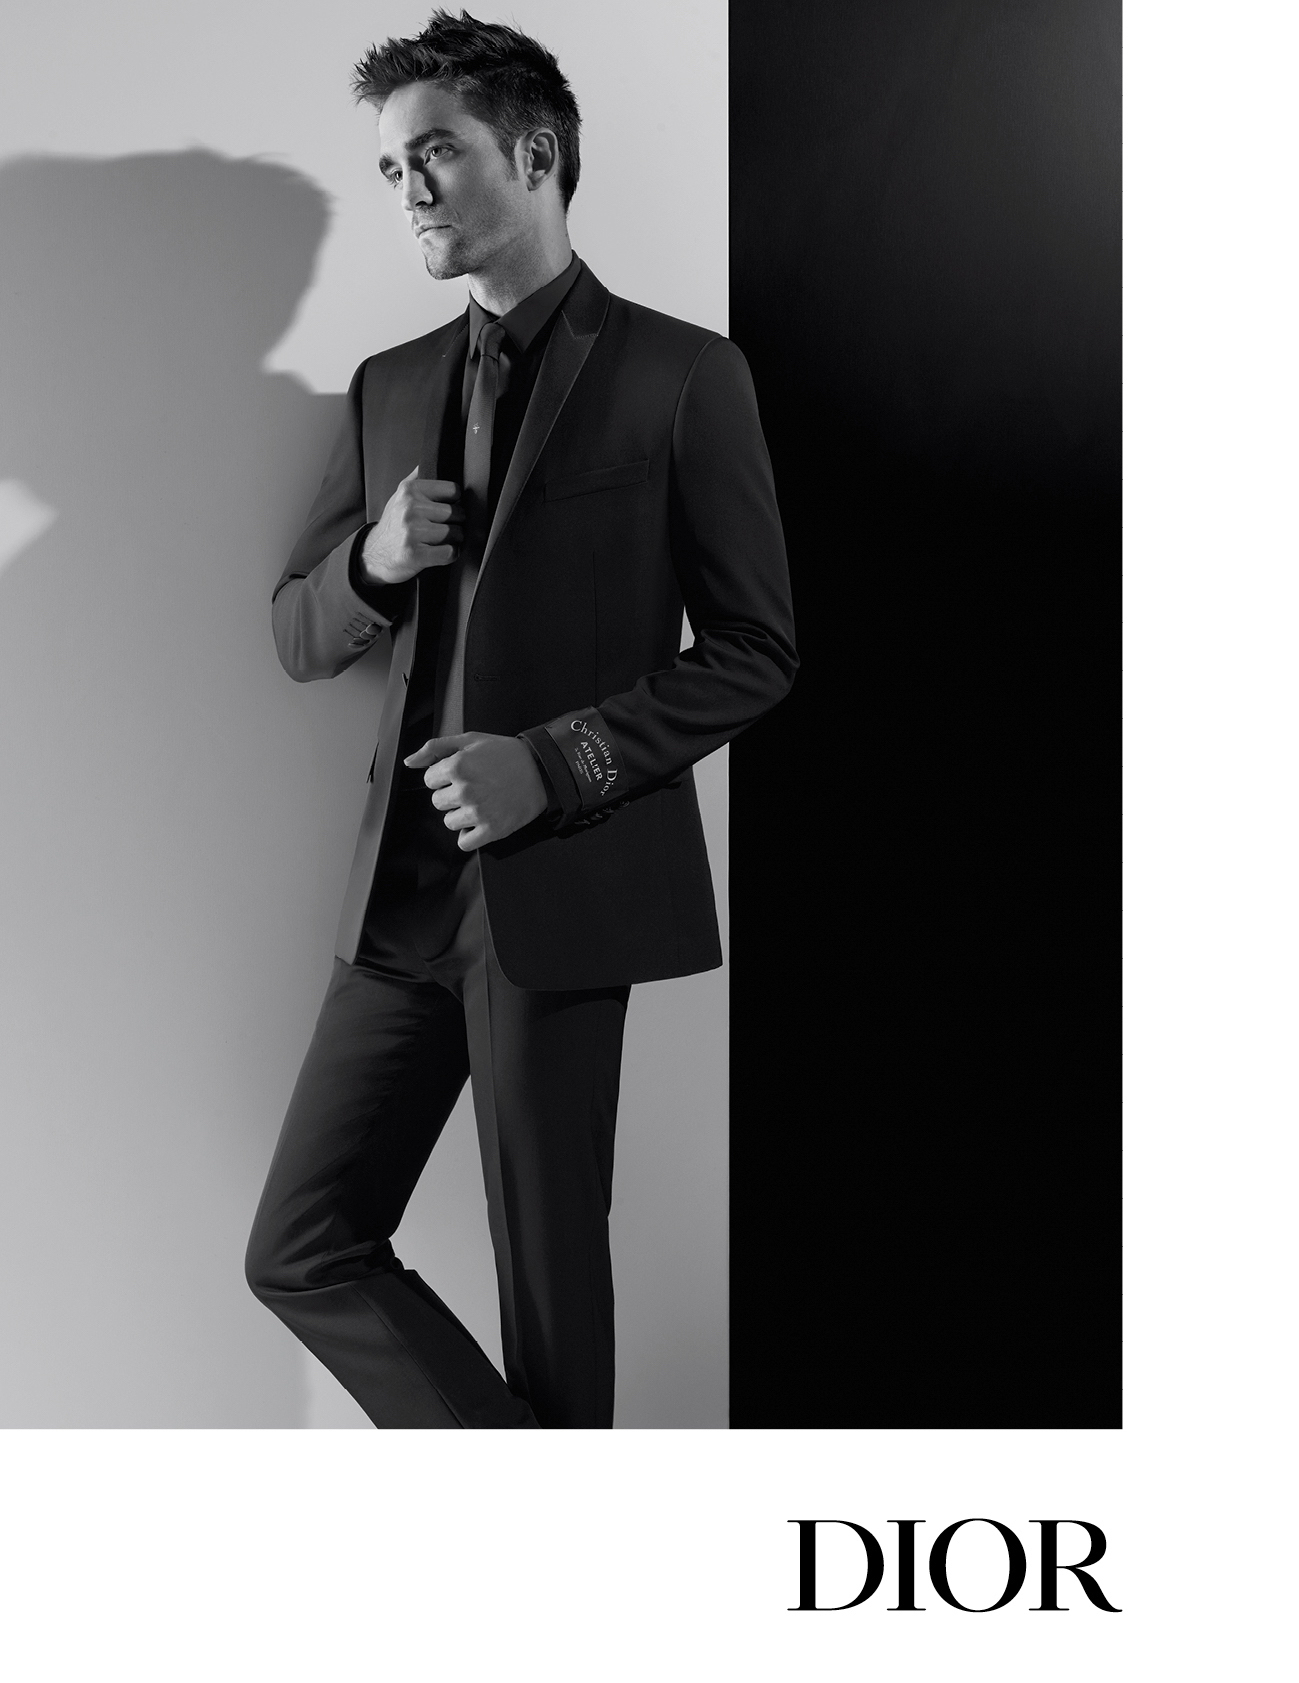 7e269da403 Robert Pattinson is the Face of Dior Homme Autumn 2018 - MODERN ...